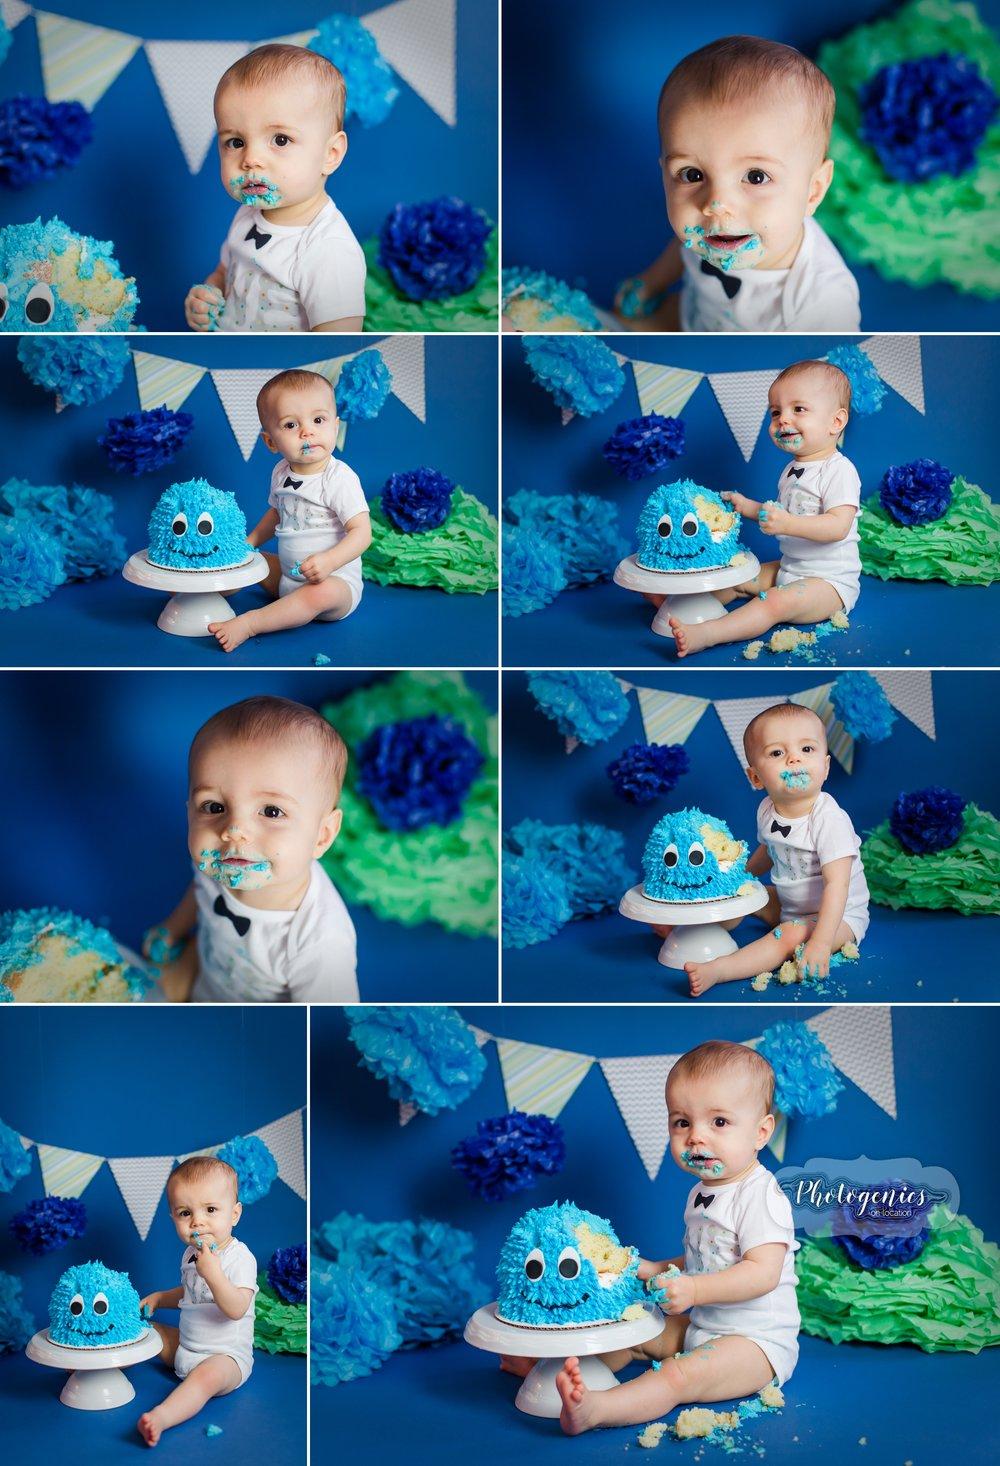 monster_cake_smash_boy_ideas_photography_poses_set_design_12_month_birthday_theme_pics